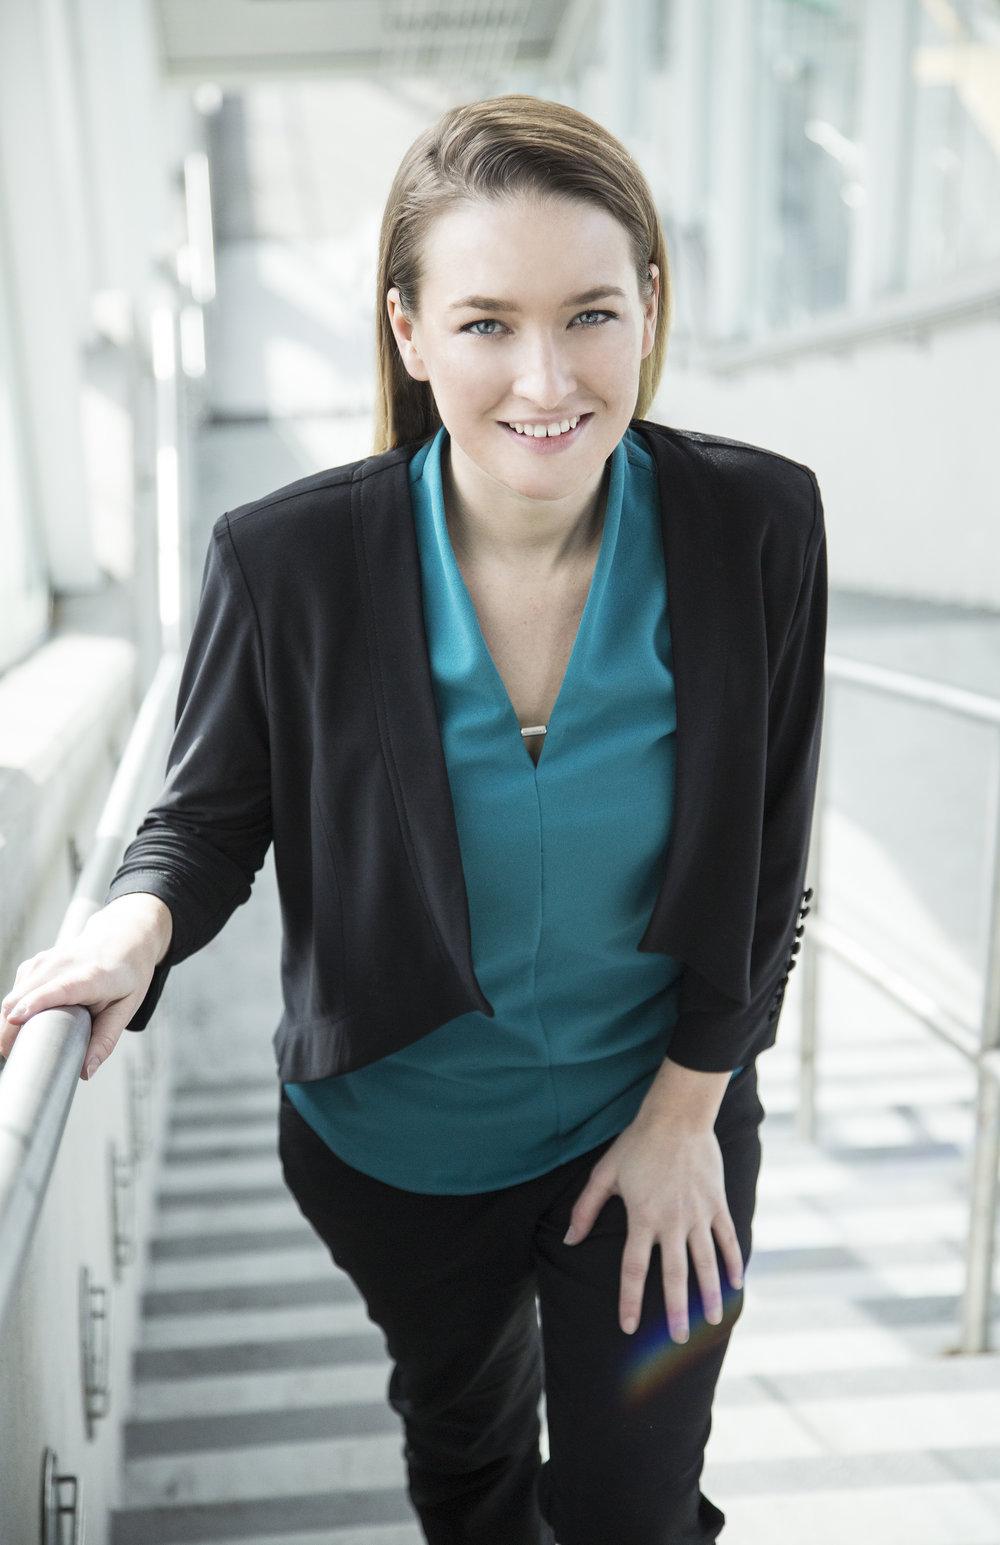 Jillian_Littlejohn_Brand_Yourself_Mastermind_Women_On_A_Mission_Erin_Brennan_Brand_Strategist